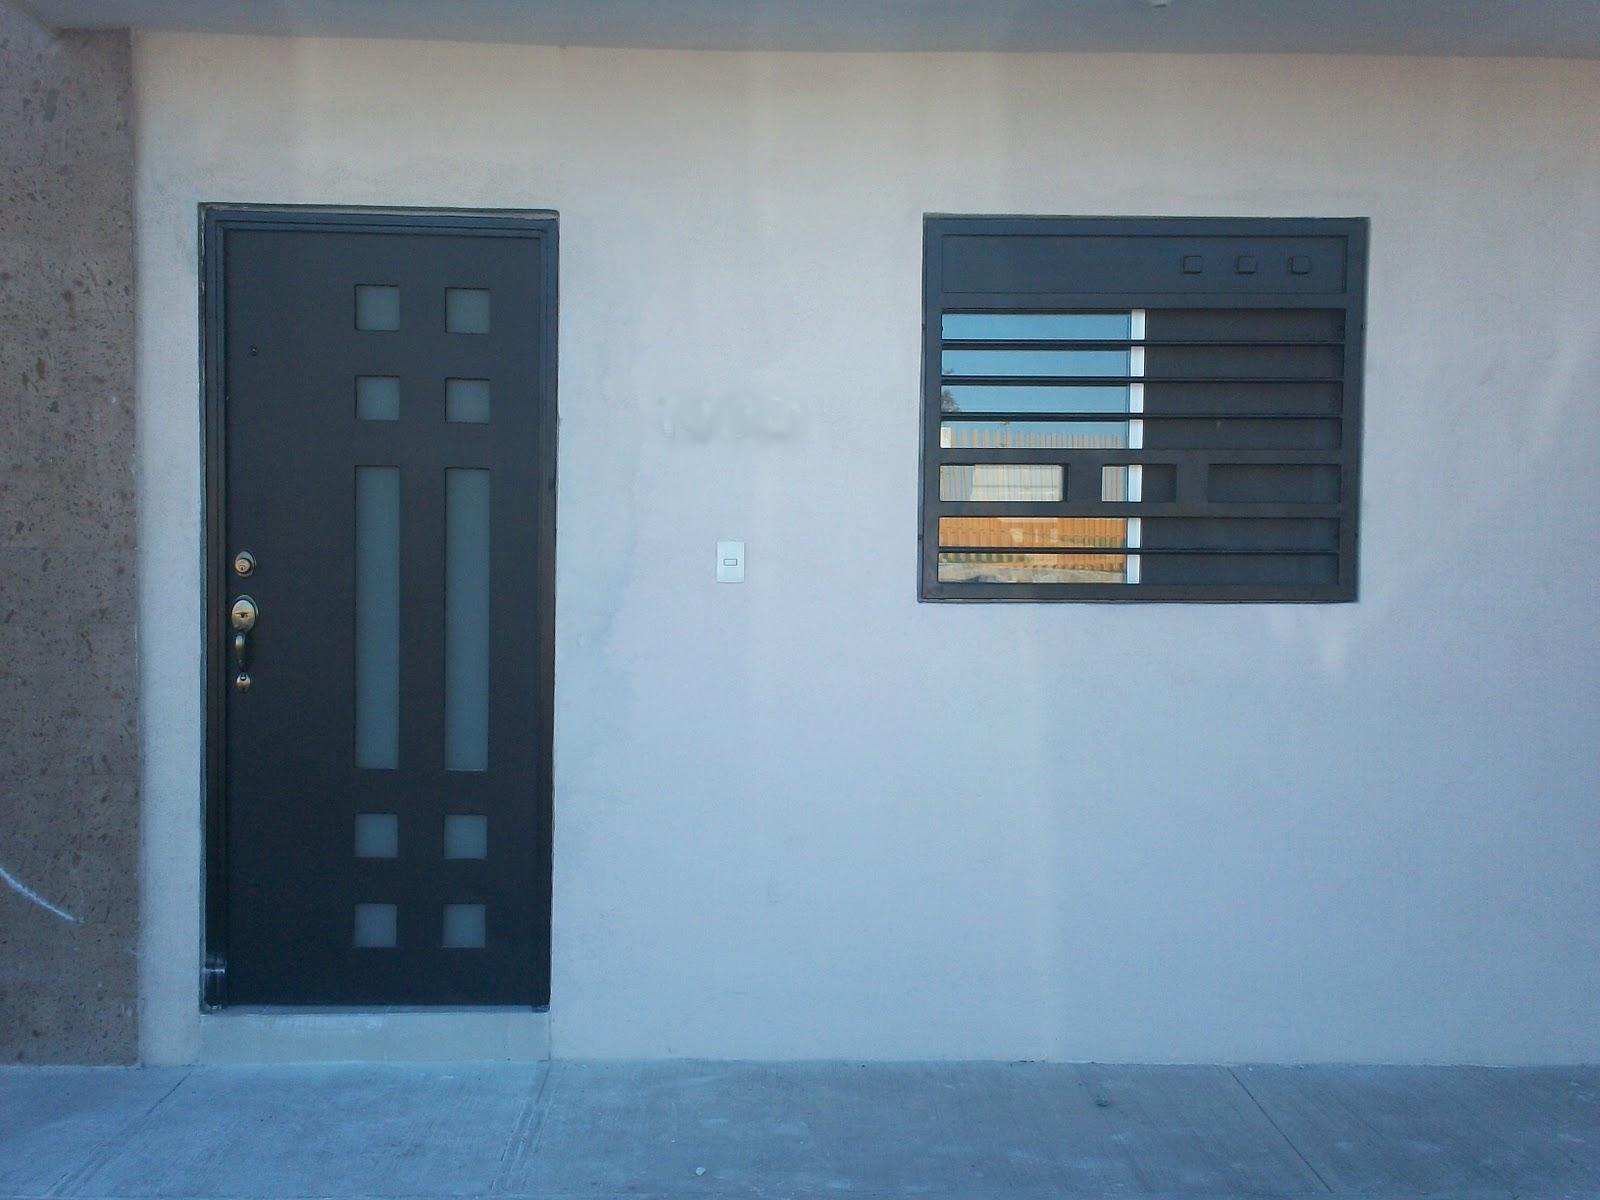 Fotos y diseos de ventanas ventanas modernas para casas - Puertas para casas modernas ...